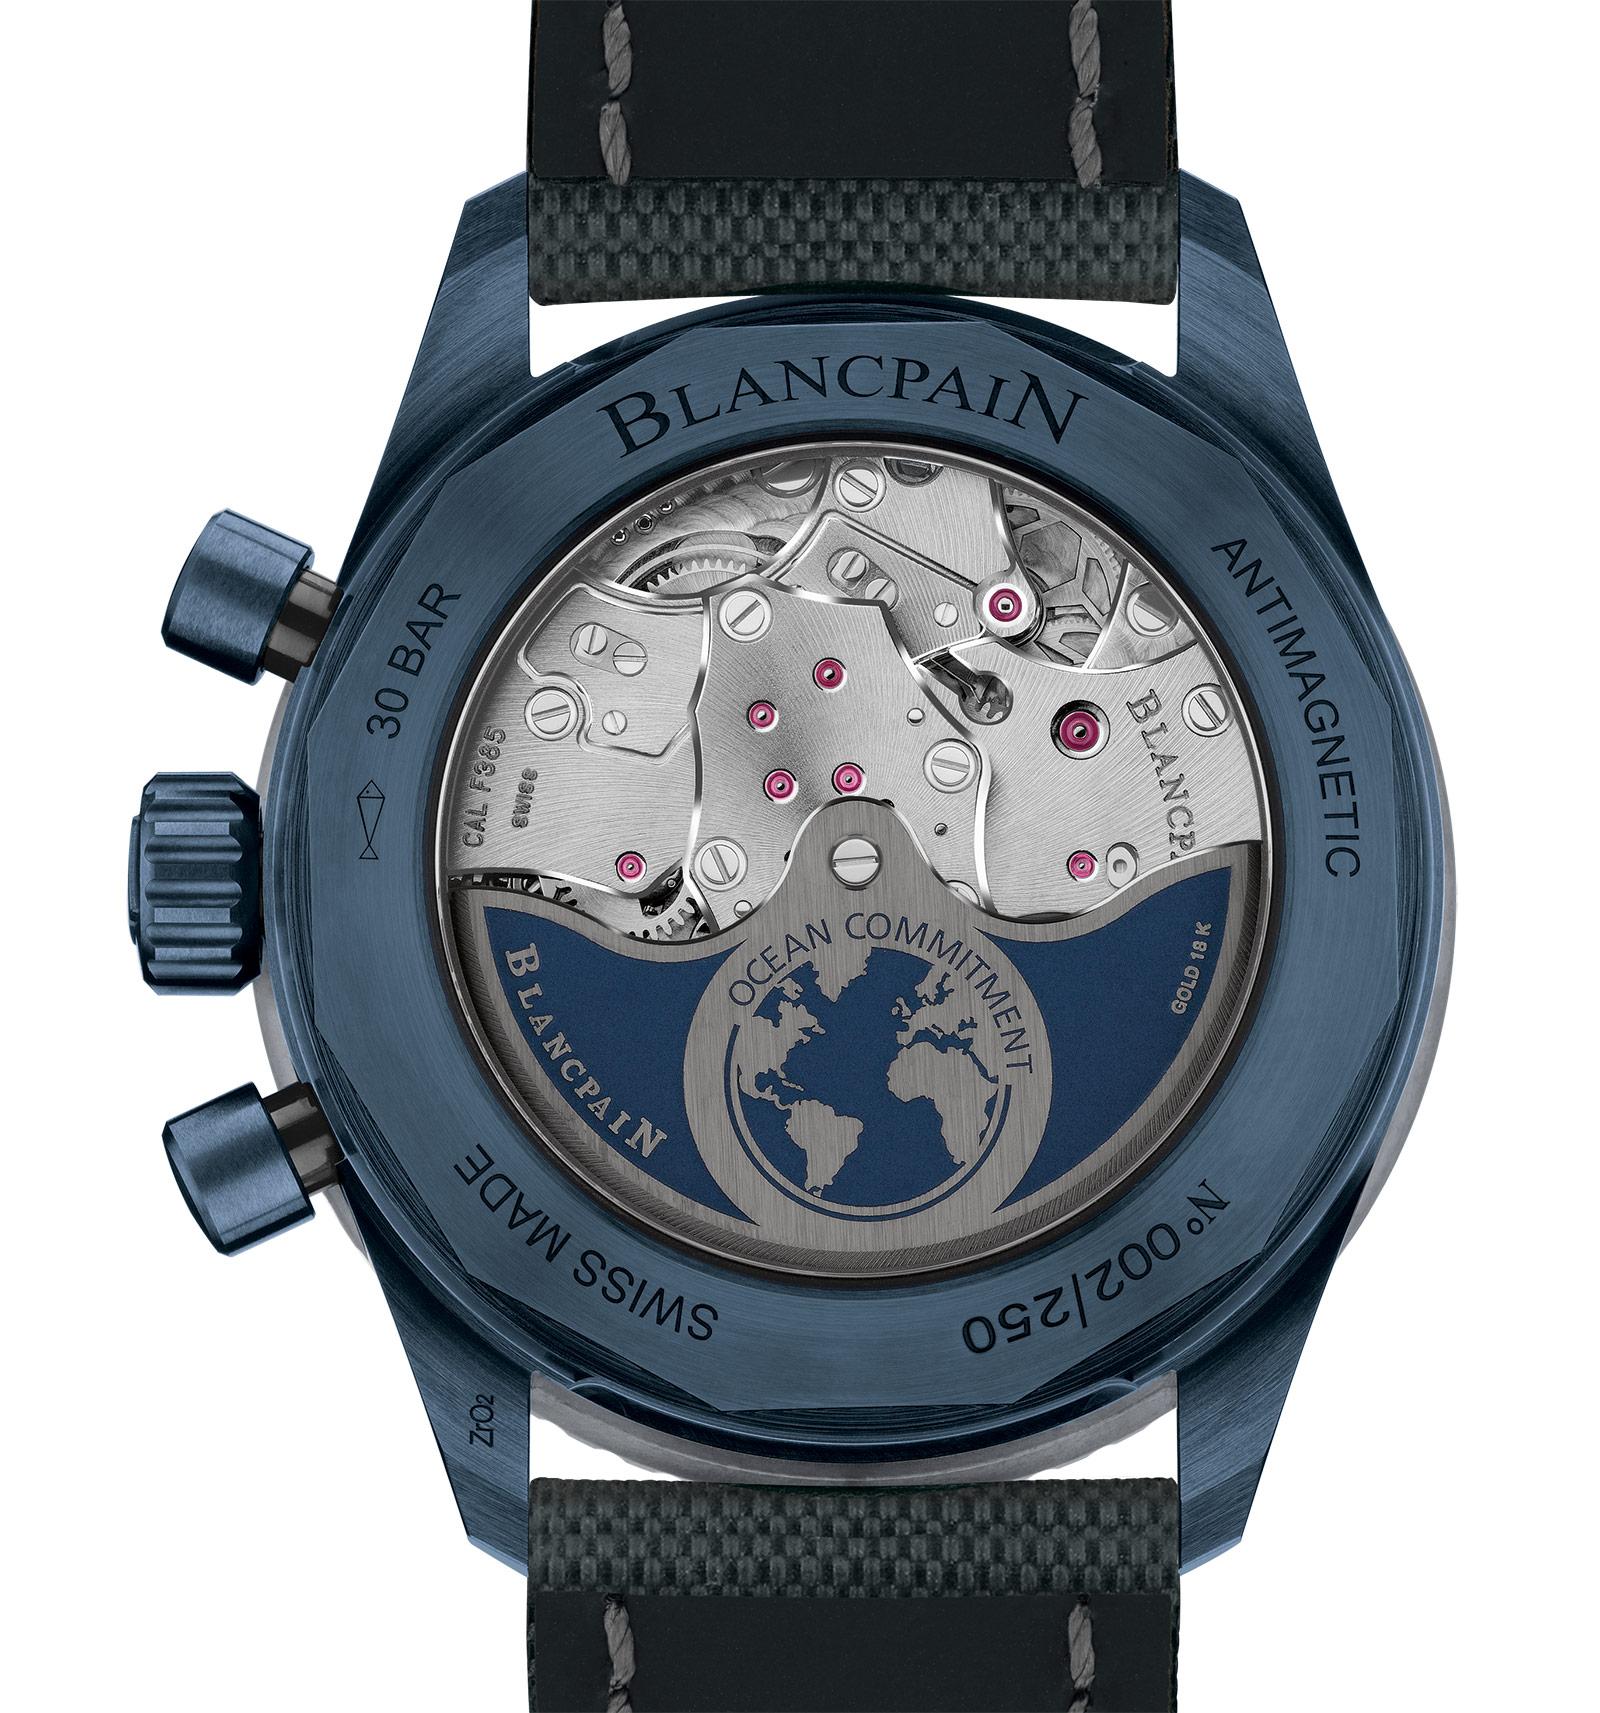 Blancpain Bathyscaphe Flyback Chronograph BOC II 1